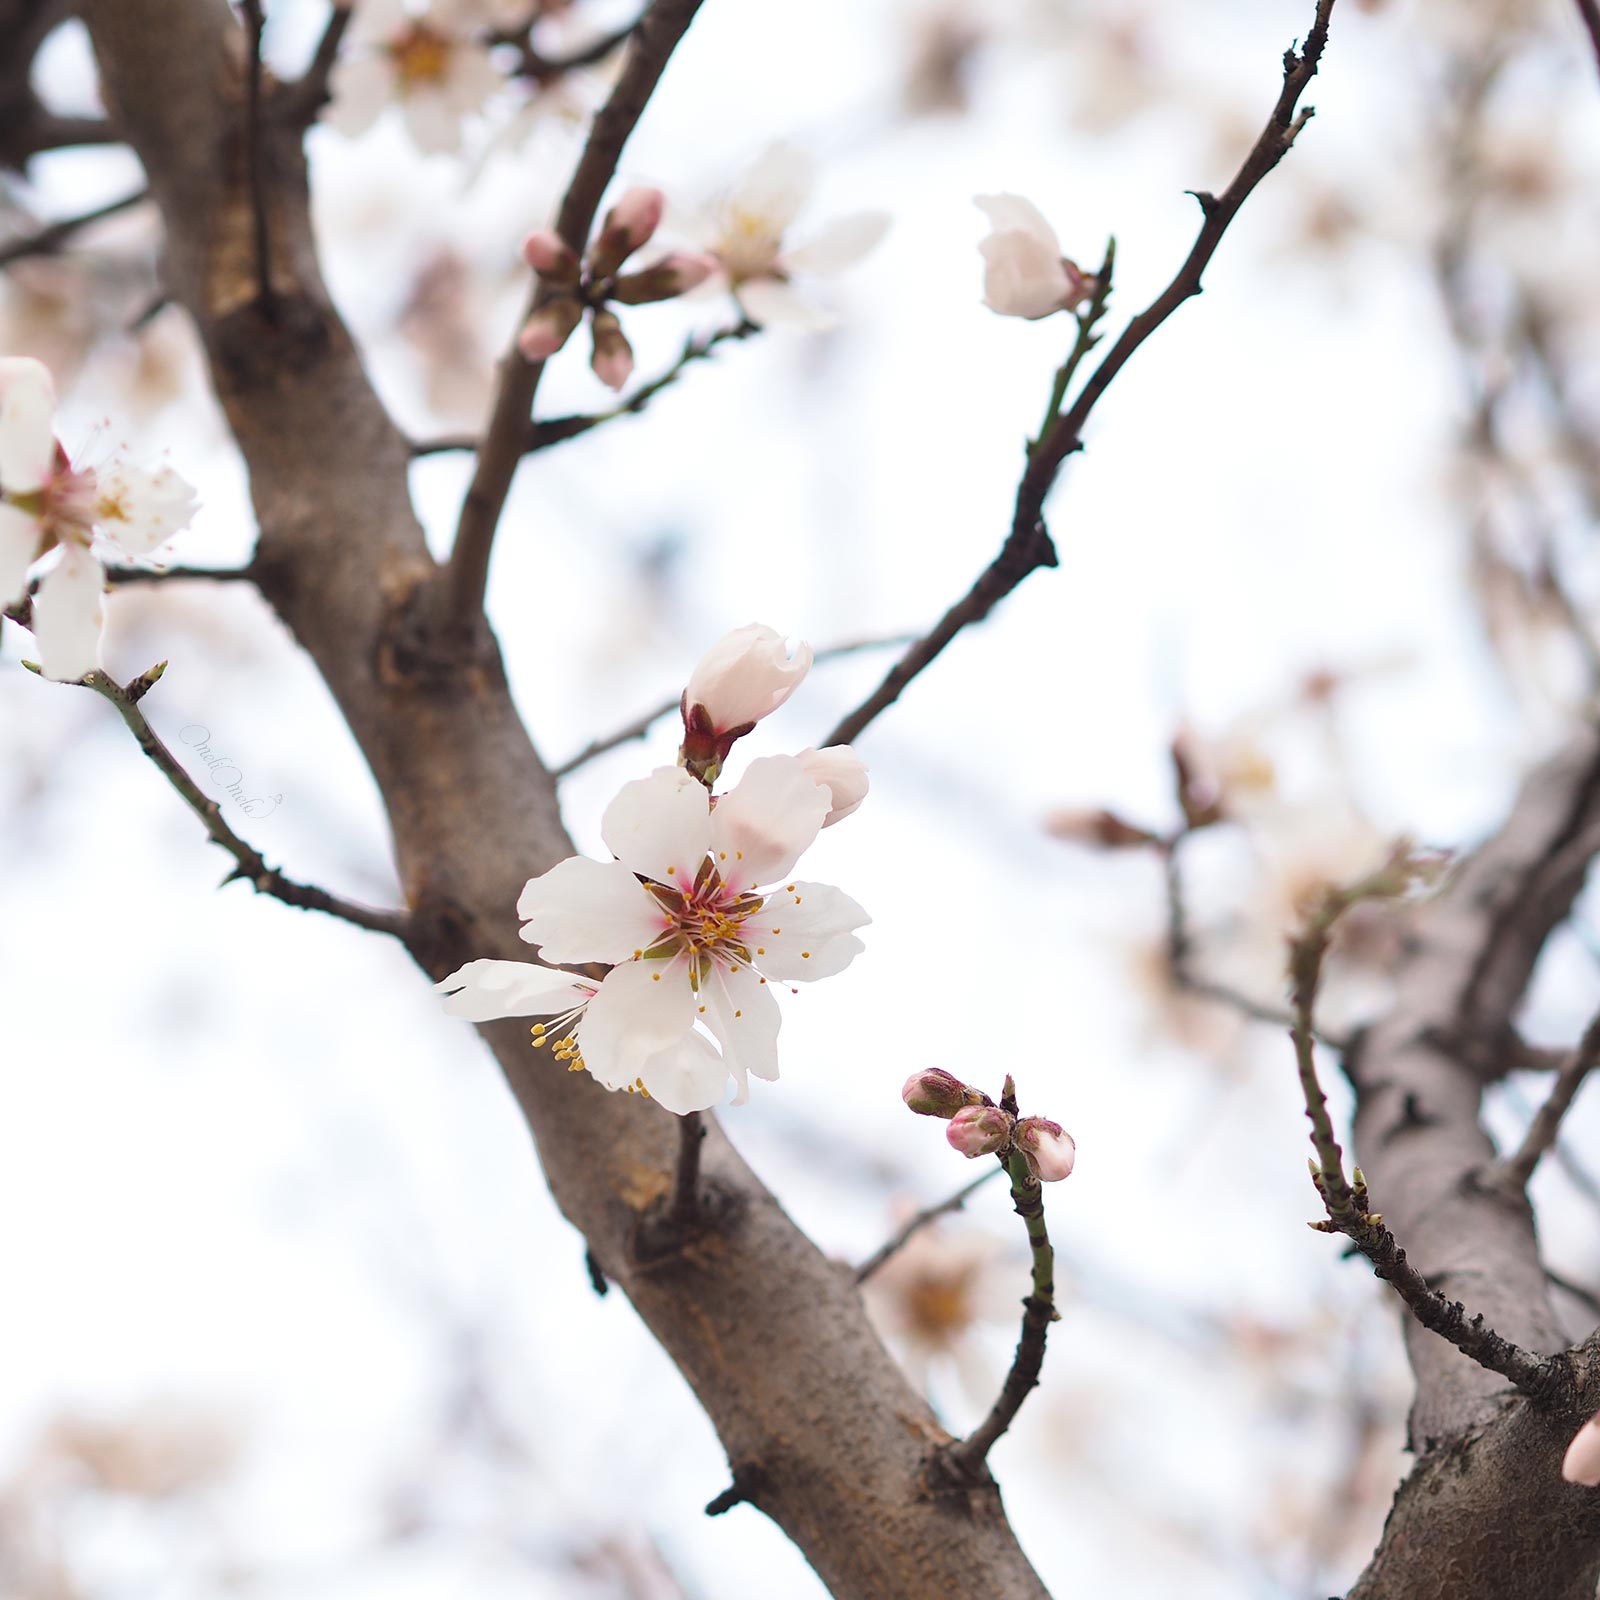 premières fleurs printemps floración primavera valladolid laboutiquedemelimelo